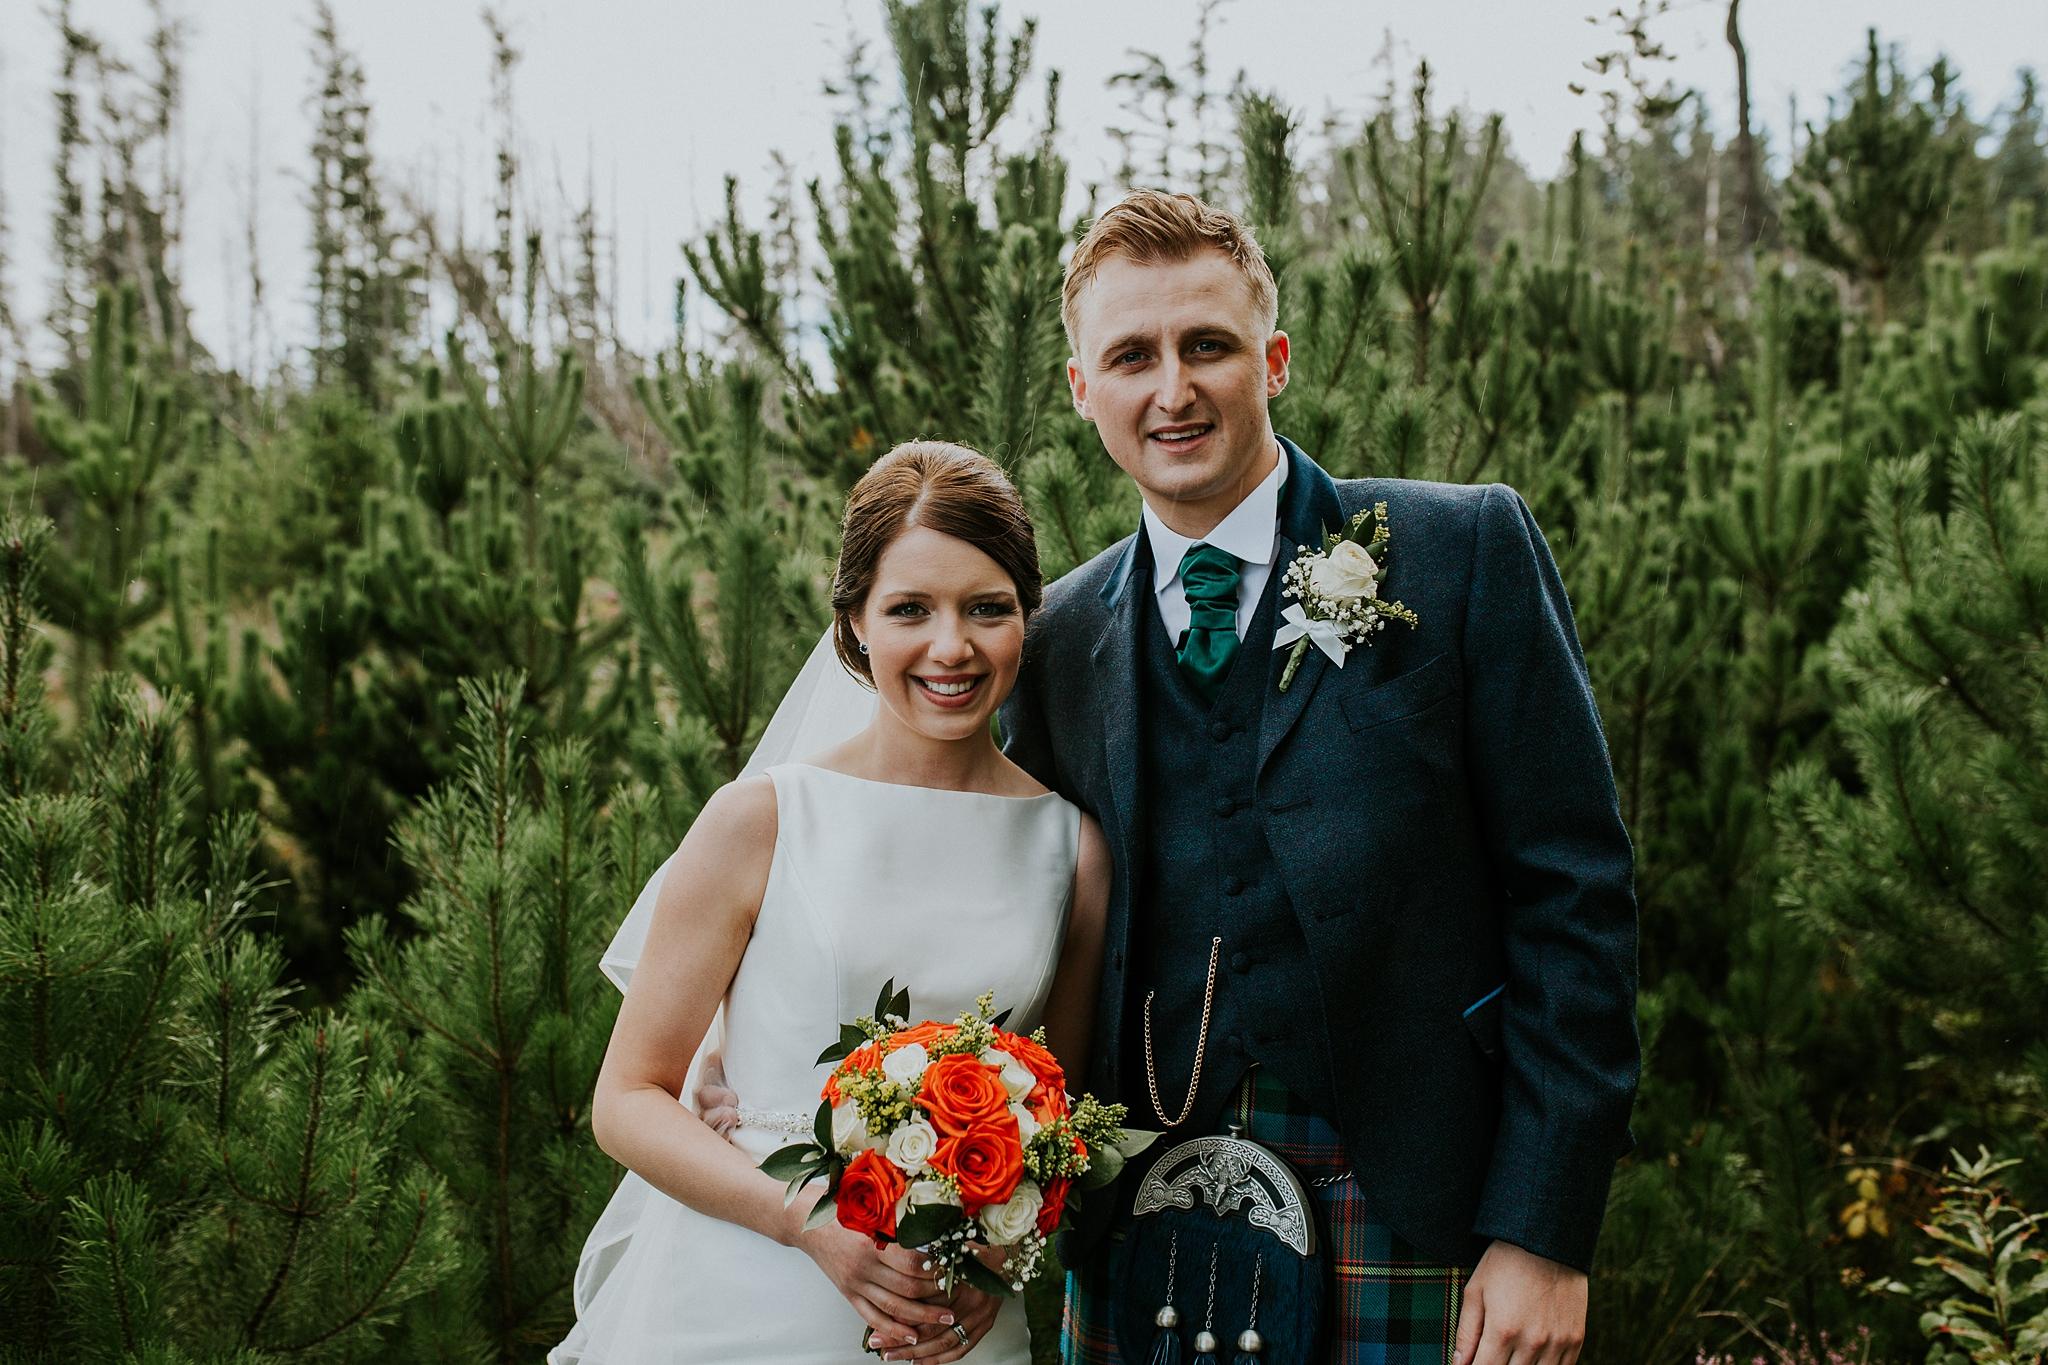 Linda&Shockie_northuist_wedding_photographer-47.JPG